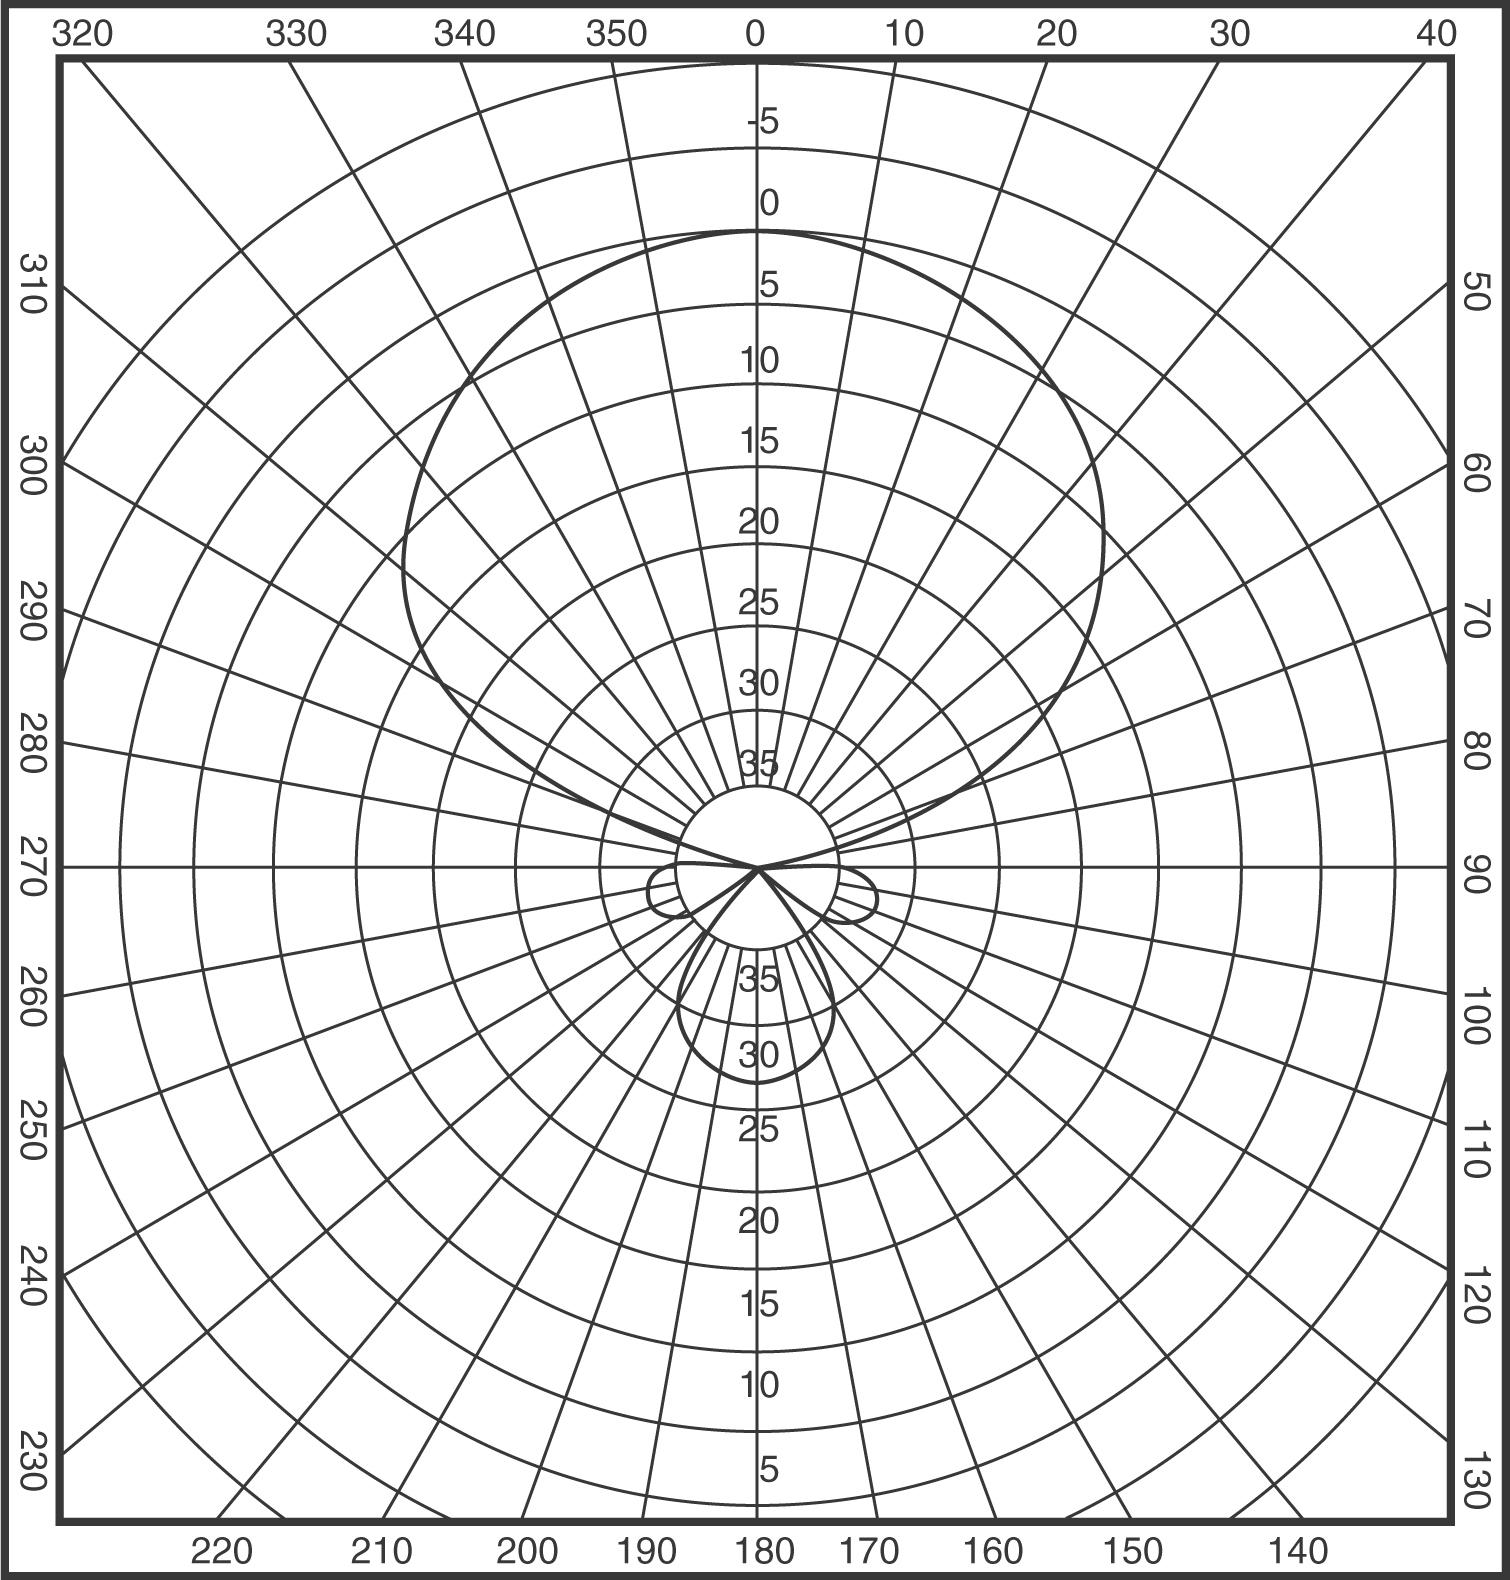 Vhf Antenna Towers | Wiring Diagram Database